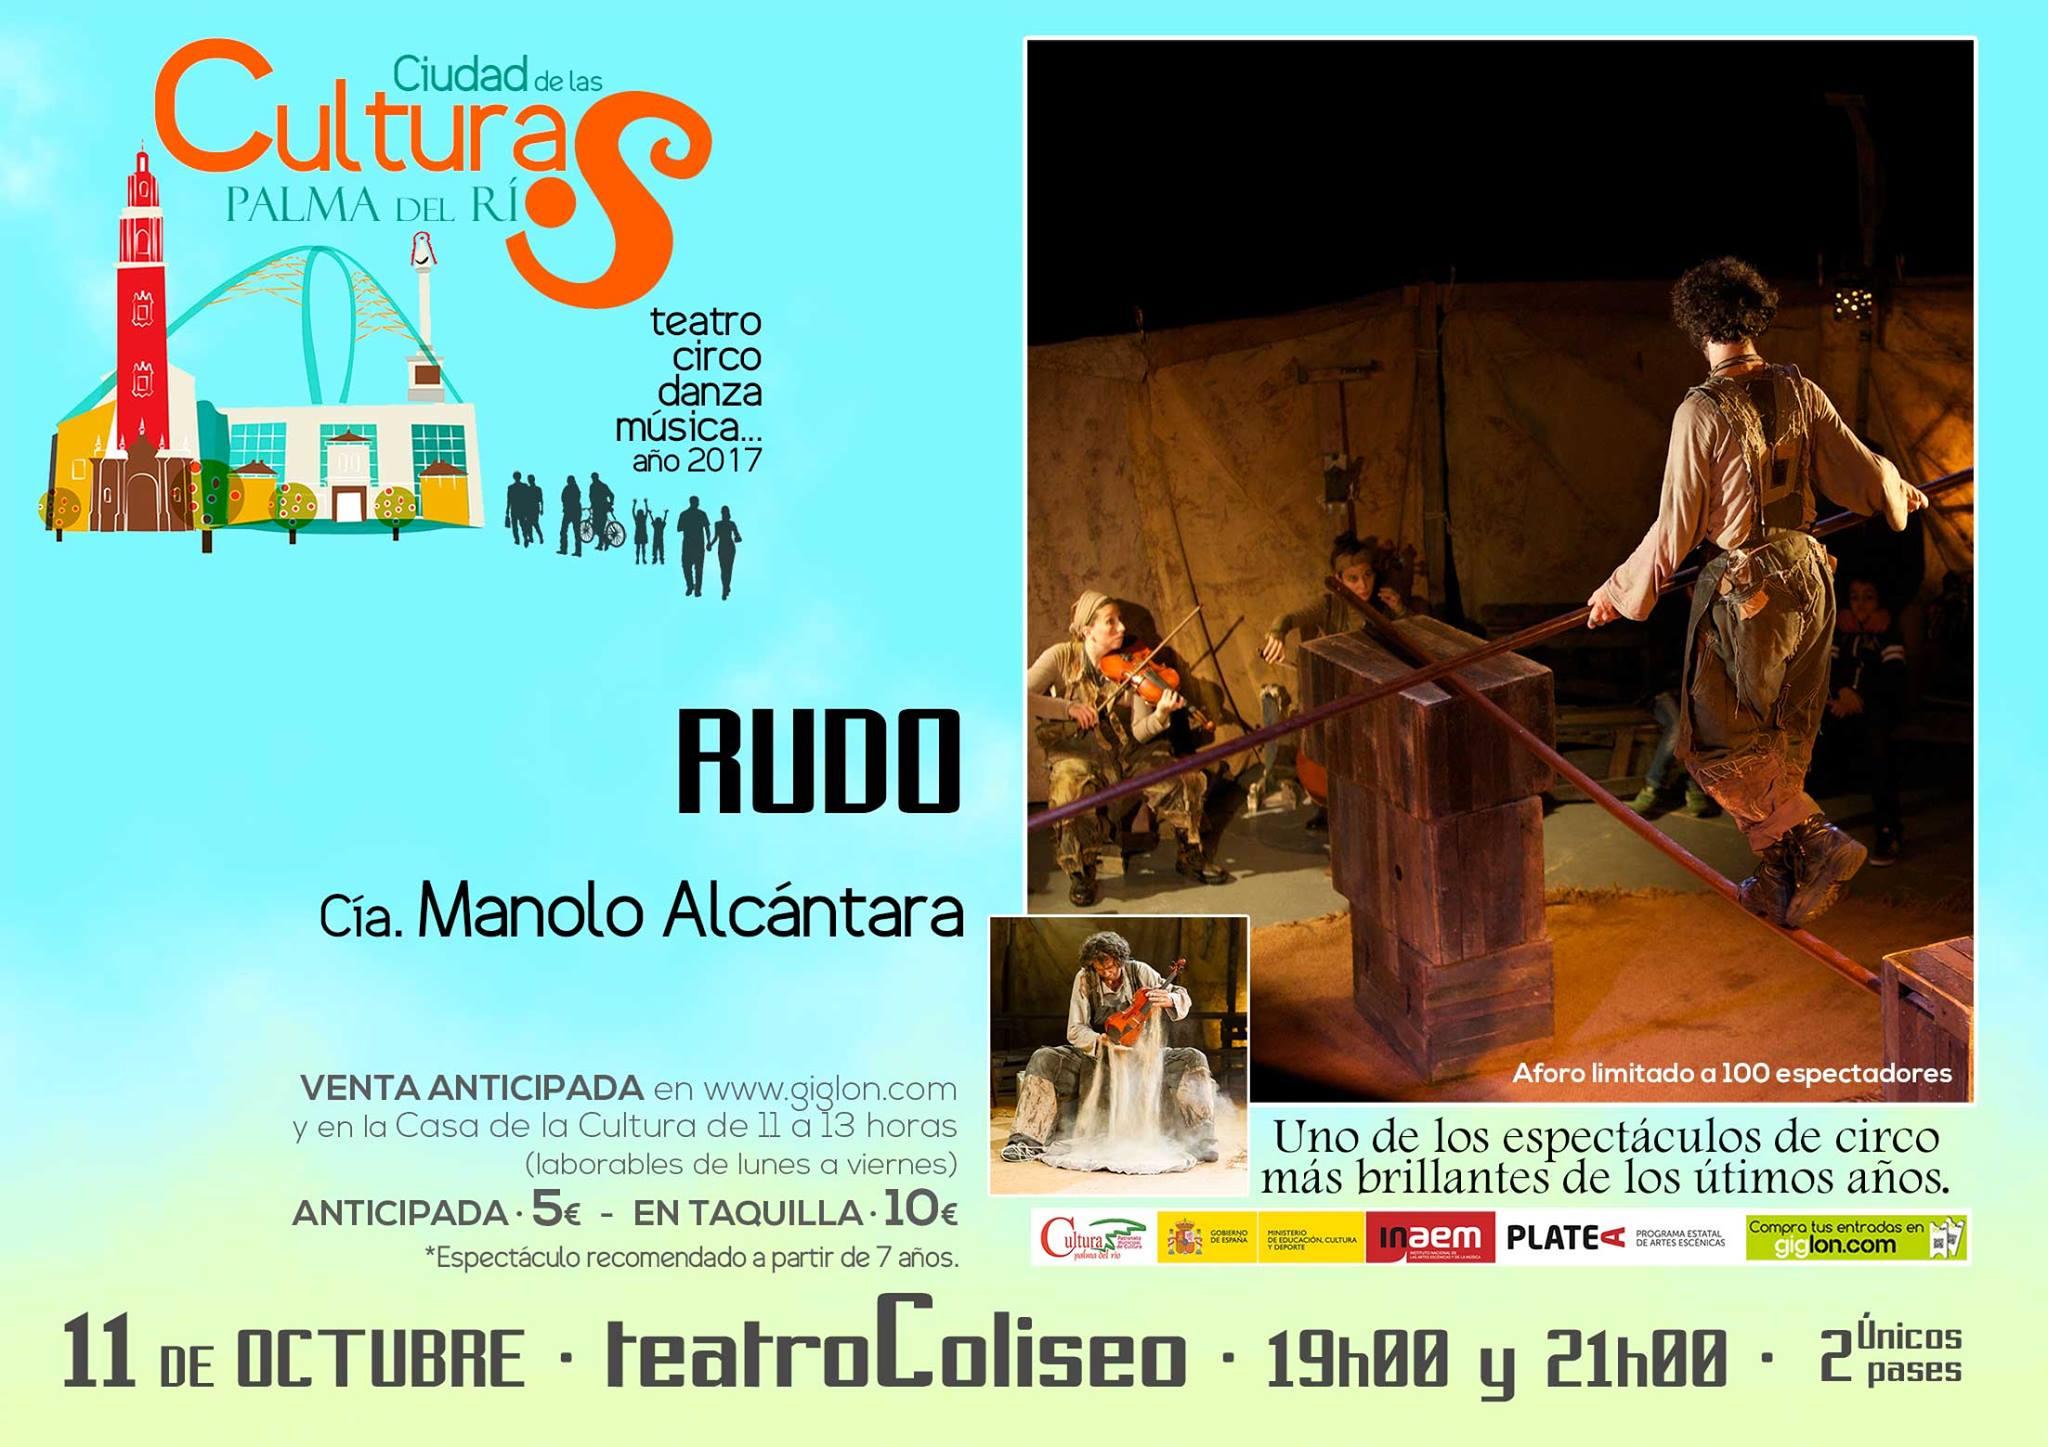 https://www.palmadelrio.es/sites/default/files/cartel_bueno_rudo.jpg